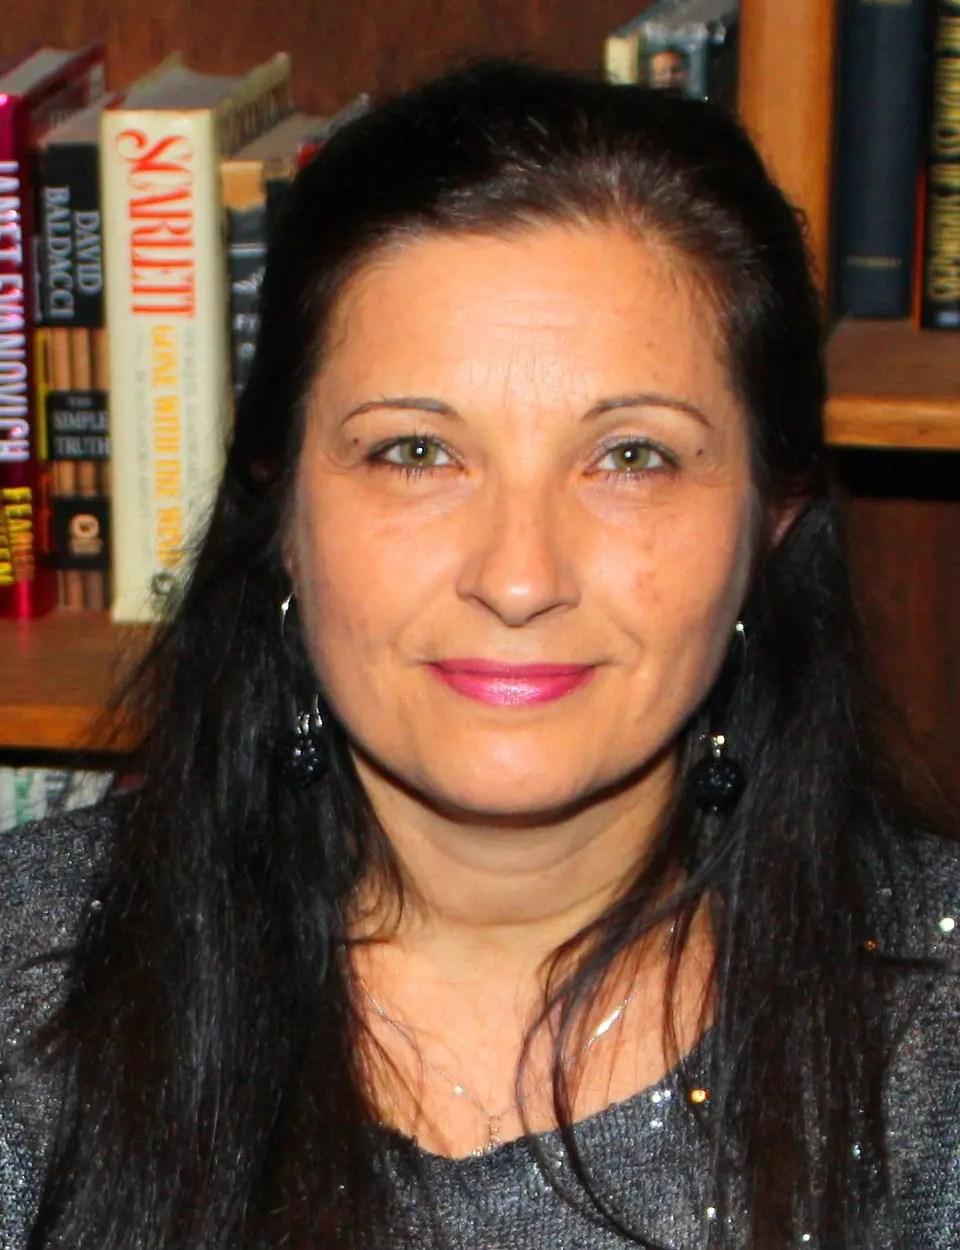 Svetlana Ardans, L.Ac., Dipl. Ac. (NCCAOM), MD (Russia)